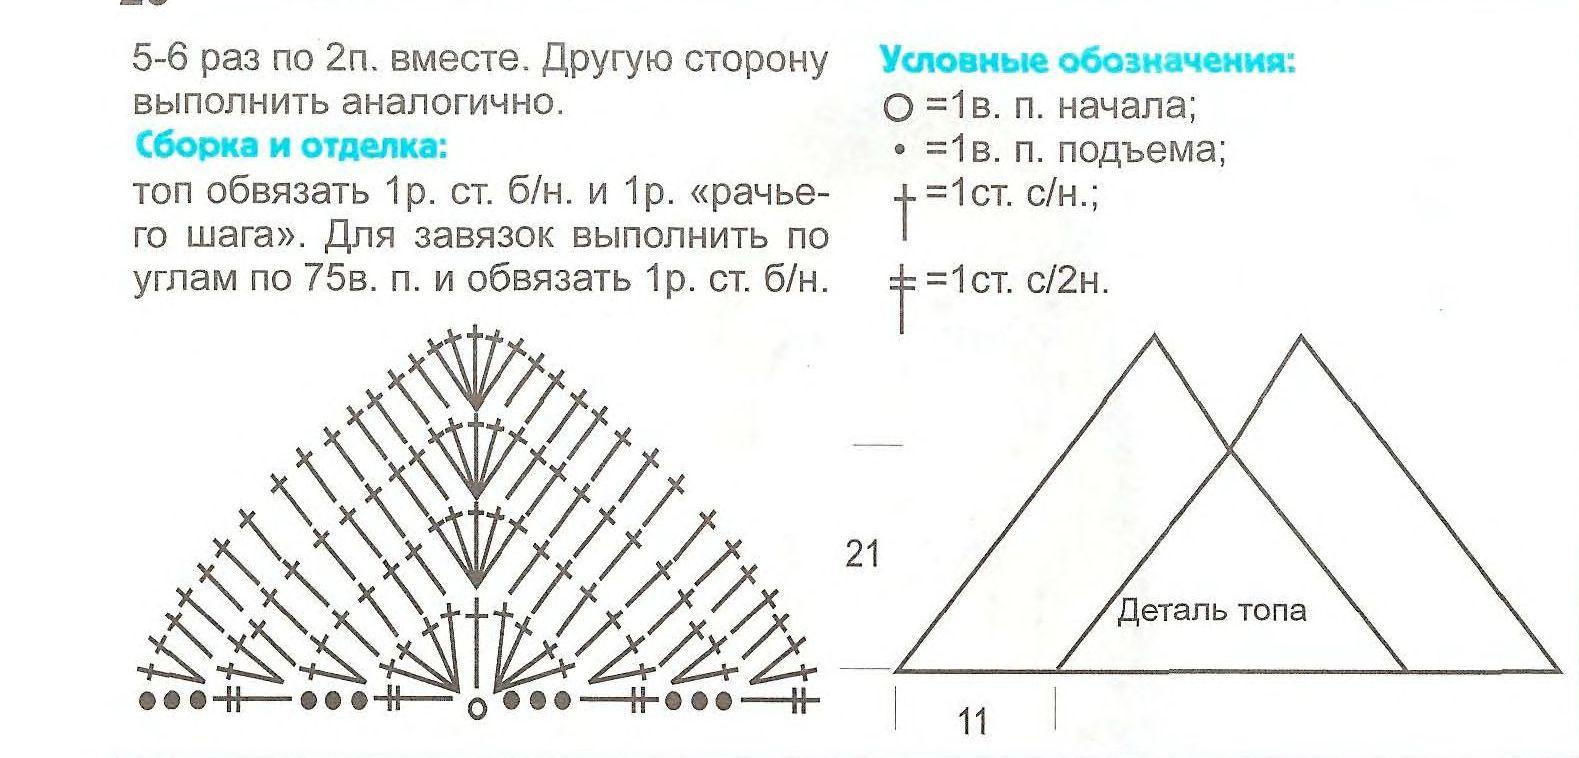 1468_792873467093093829 (3)